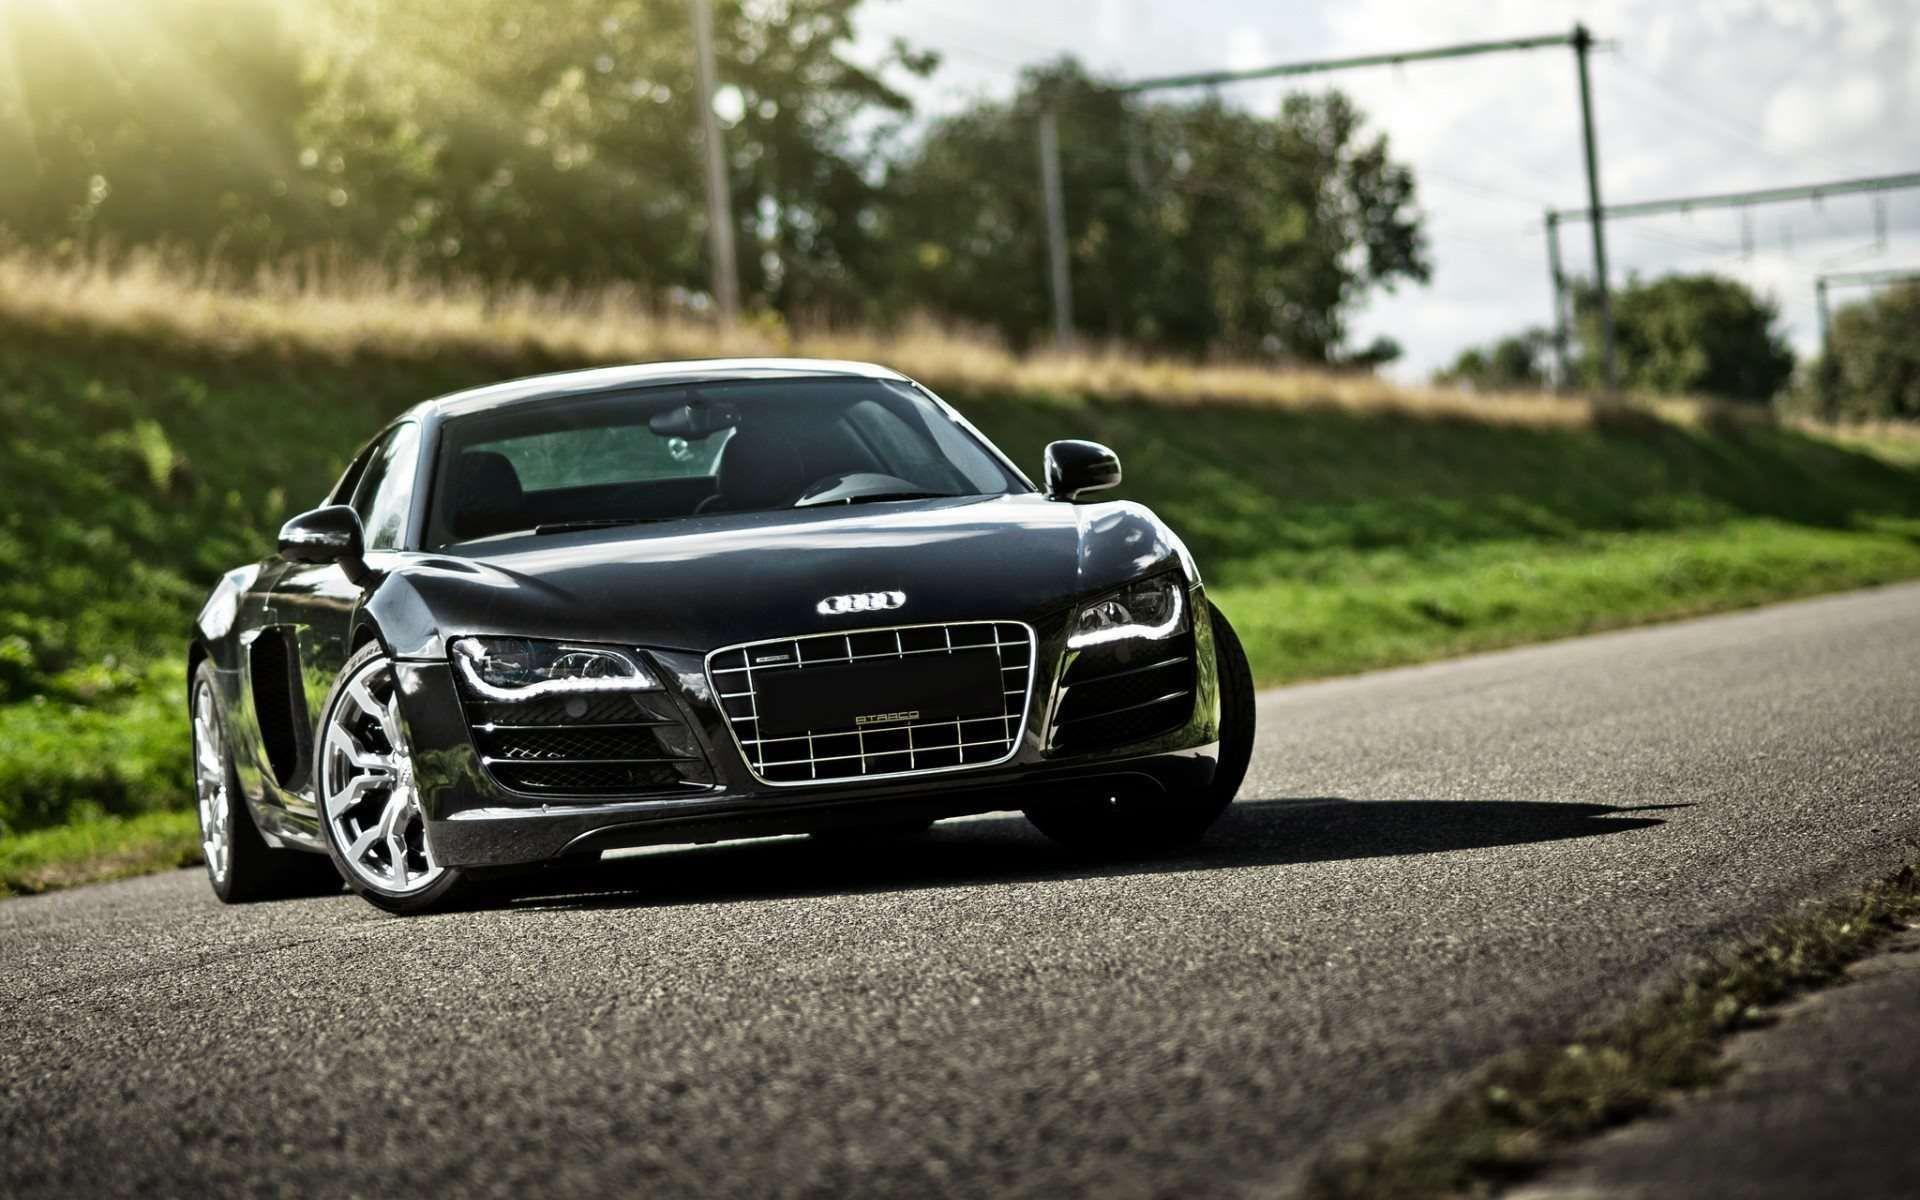 Luxurious Vw Sport Full Hd Car Wallpapers: Black Audi R8 Wallpaper HD Widescreen